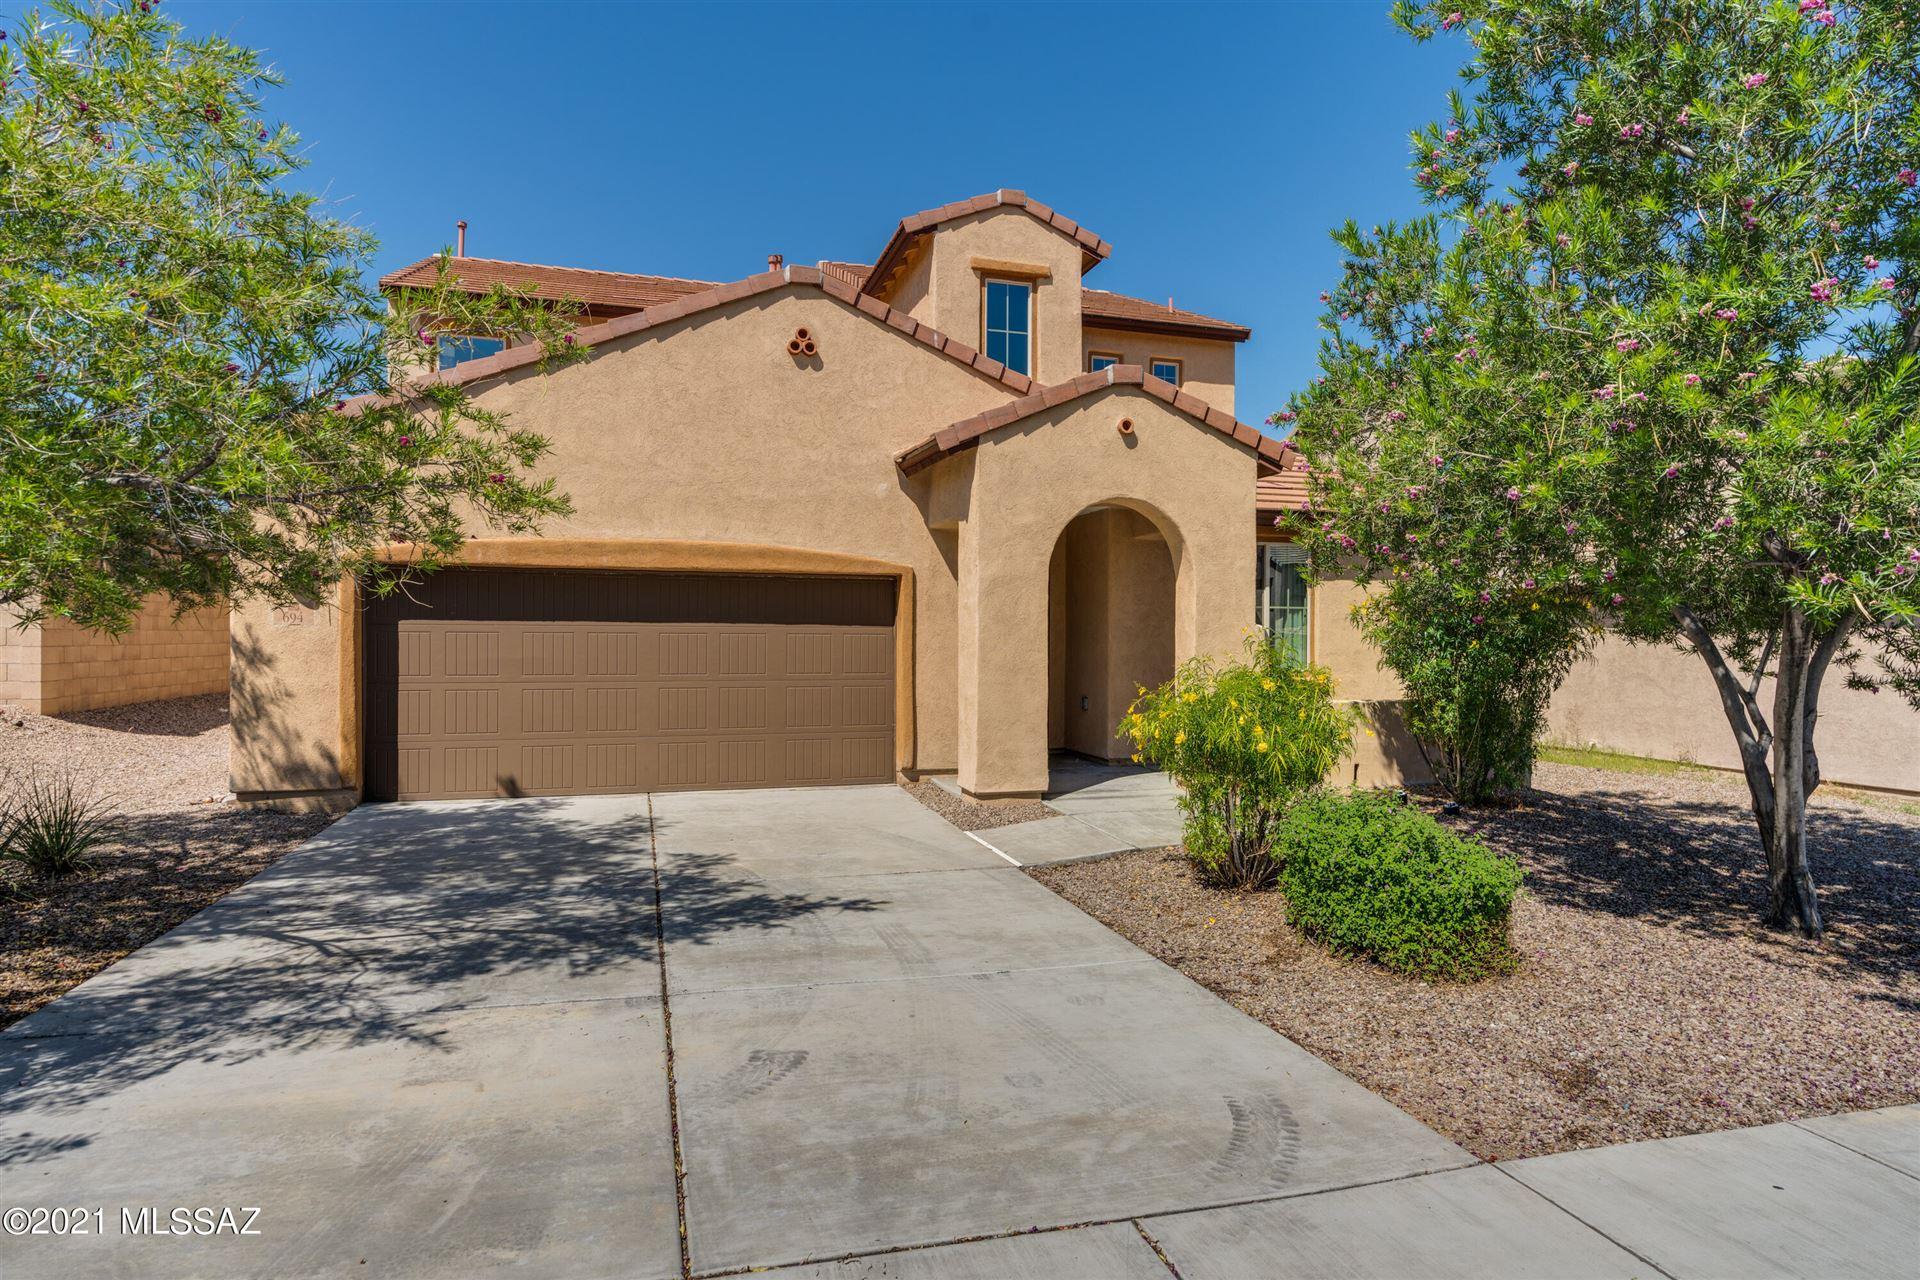 694 S Desert Haven Road, Vail, AZ 85641 - MLS#: 22119627